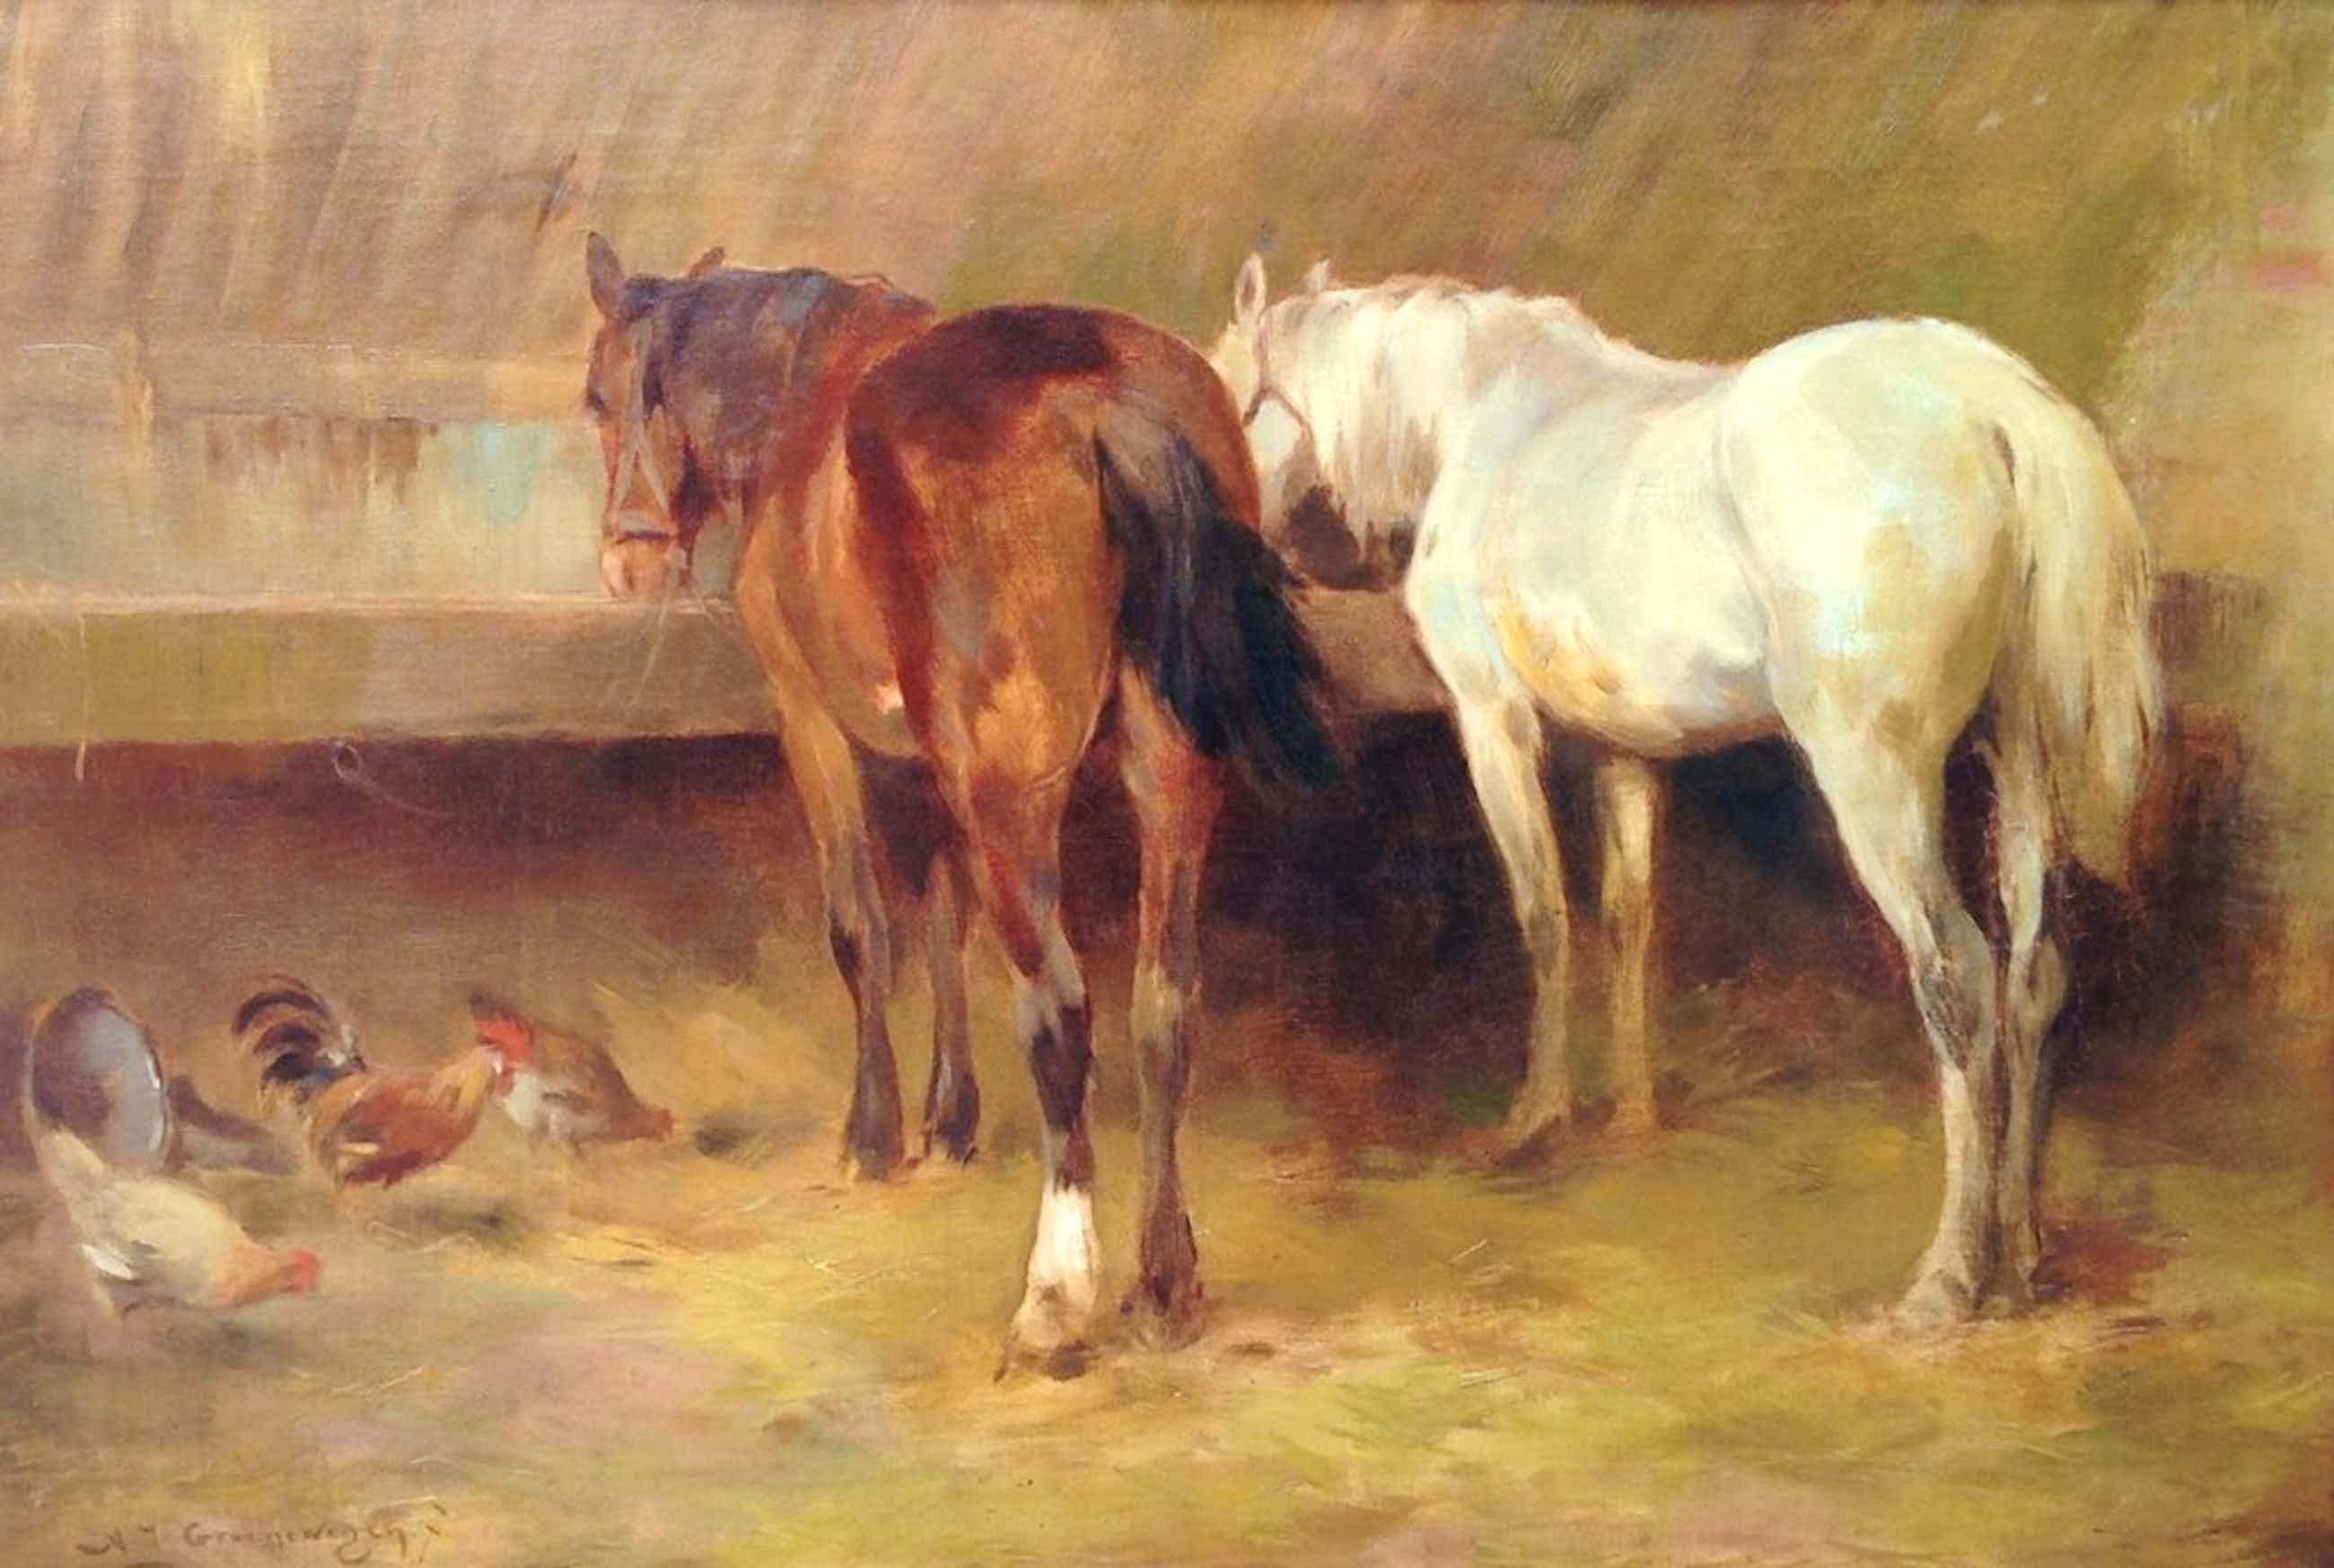 A.J. Groenewegen, Paarden in de stal kopen? Bied vanaf 285!